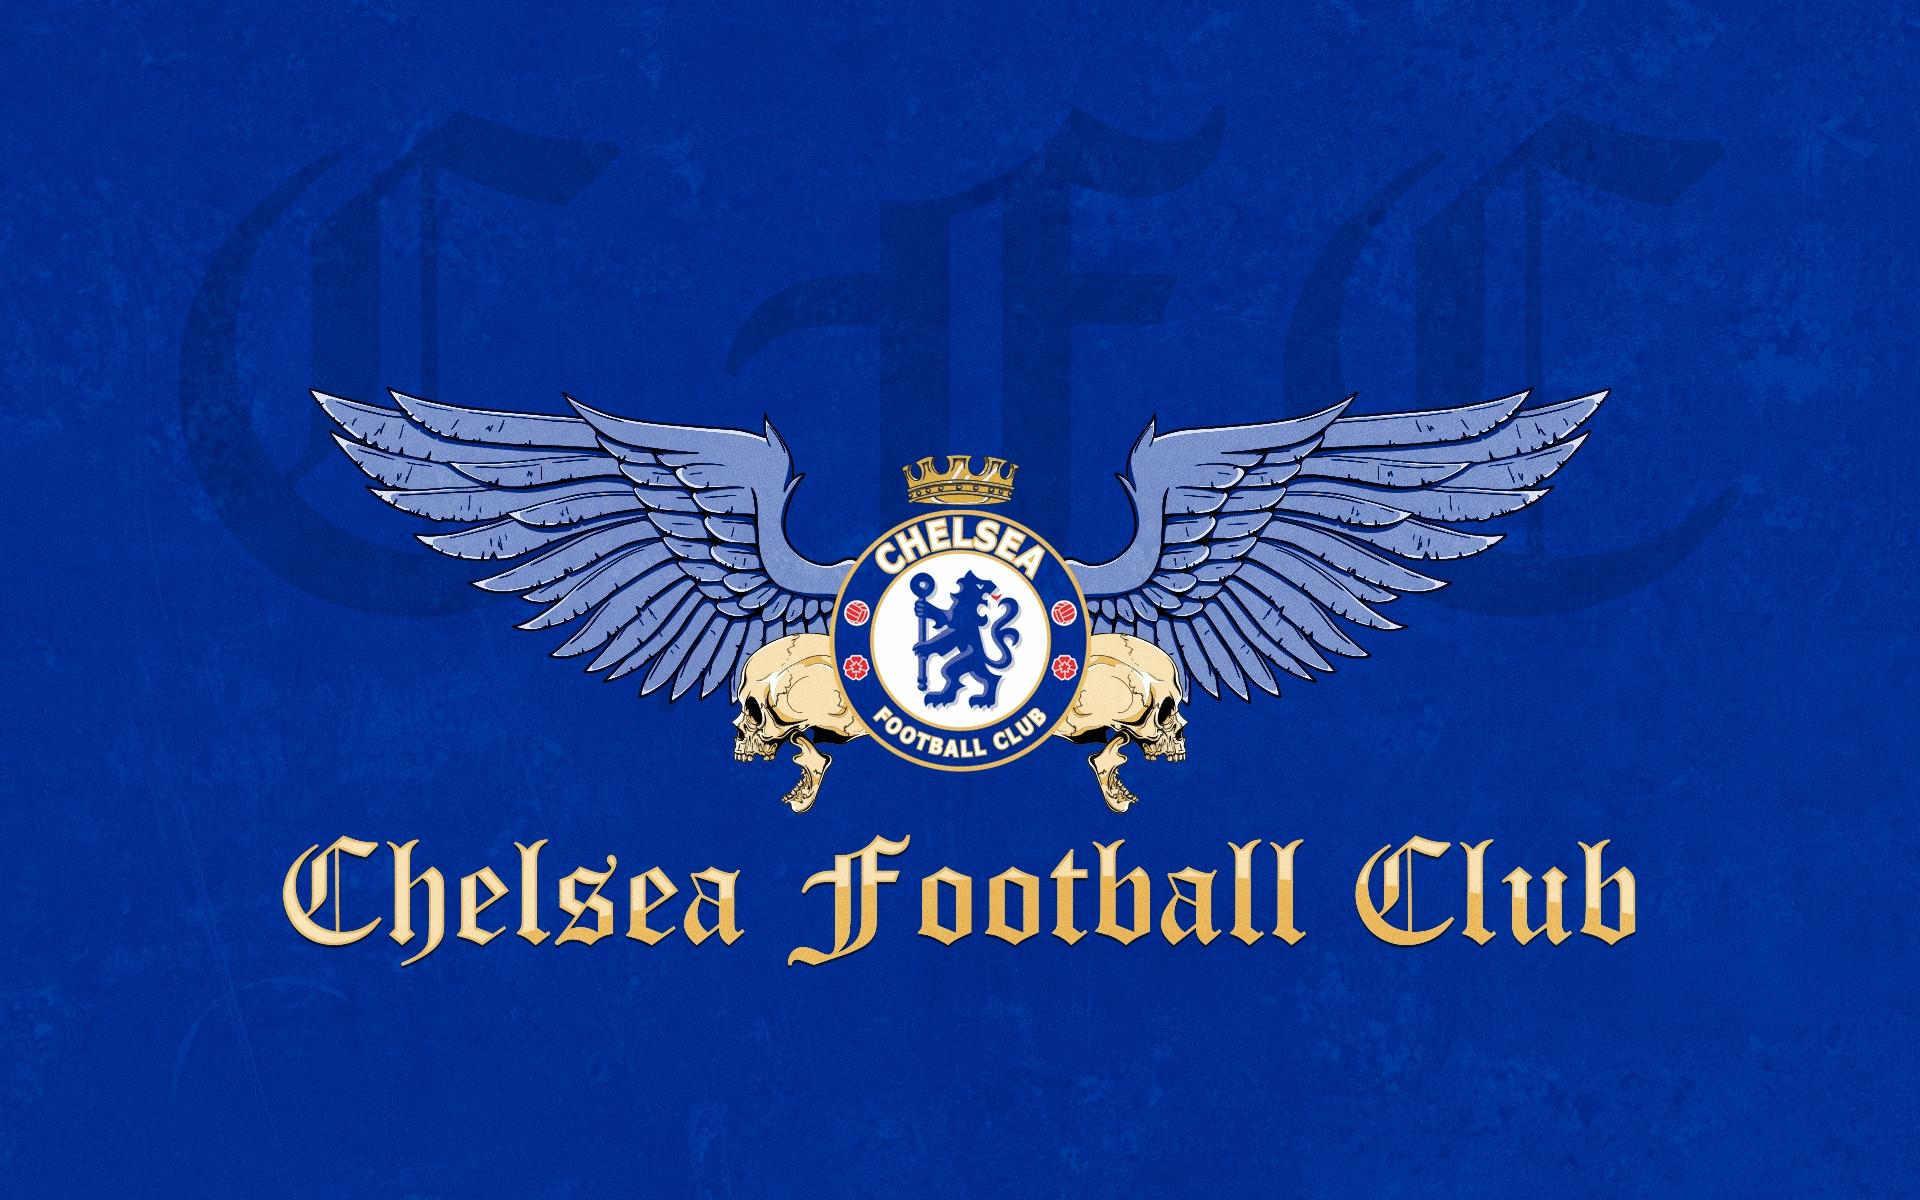 Football Club Chelsea Fc Wallpaper Logo Wallpaper with 1920x1200 1920x1200